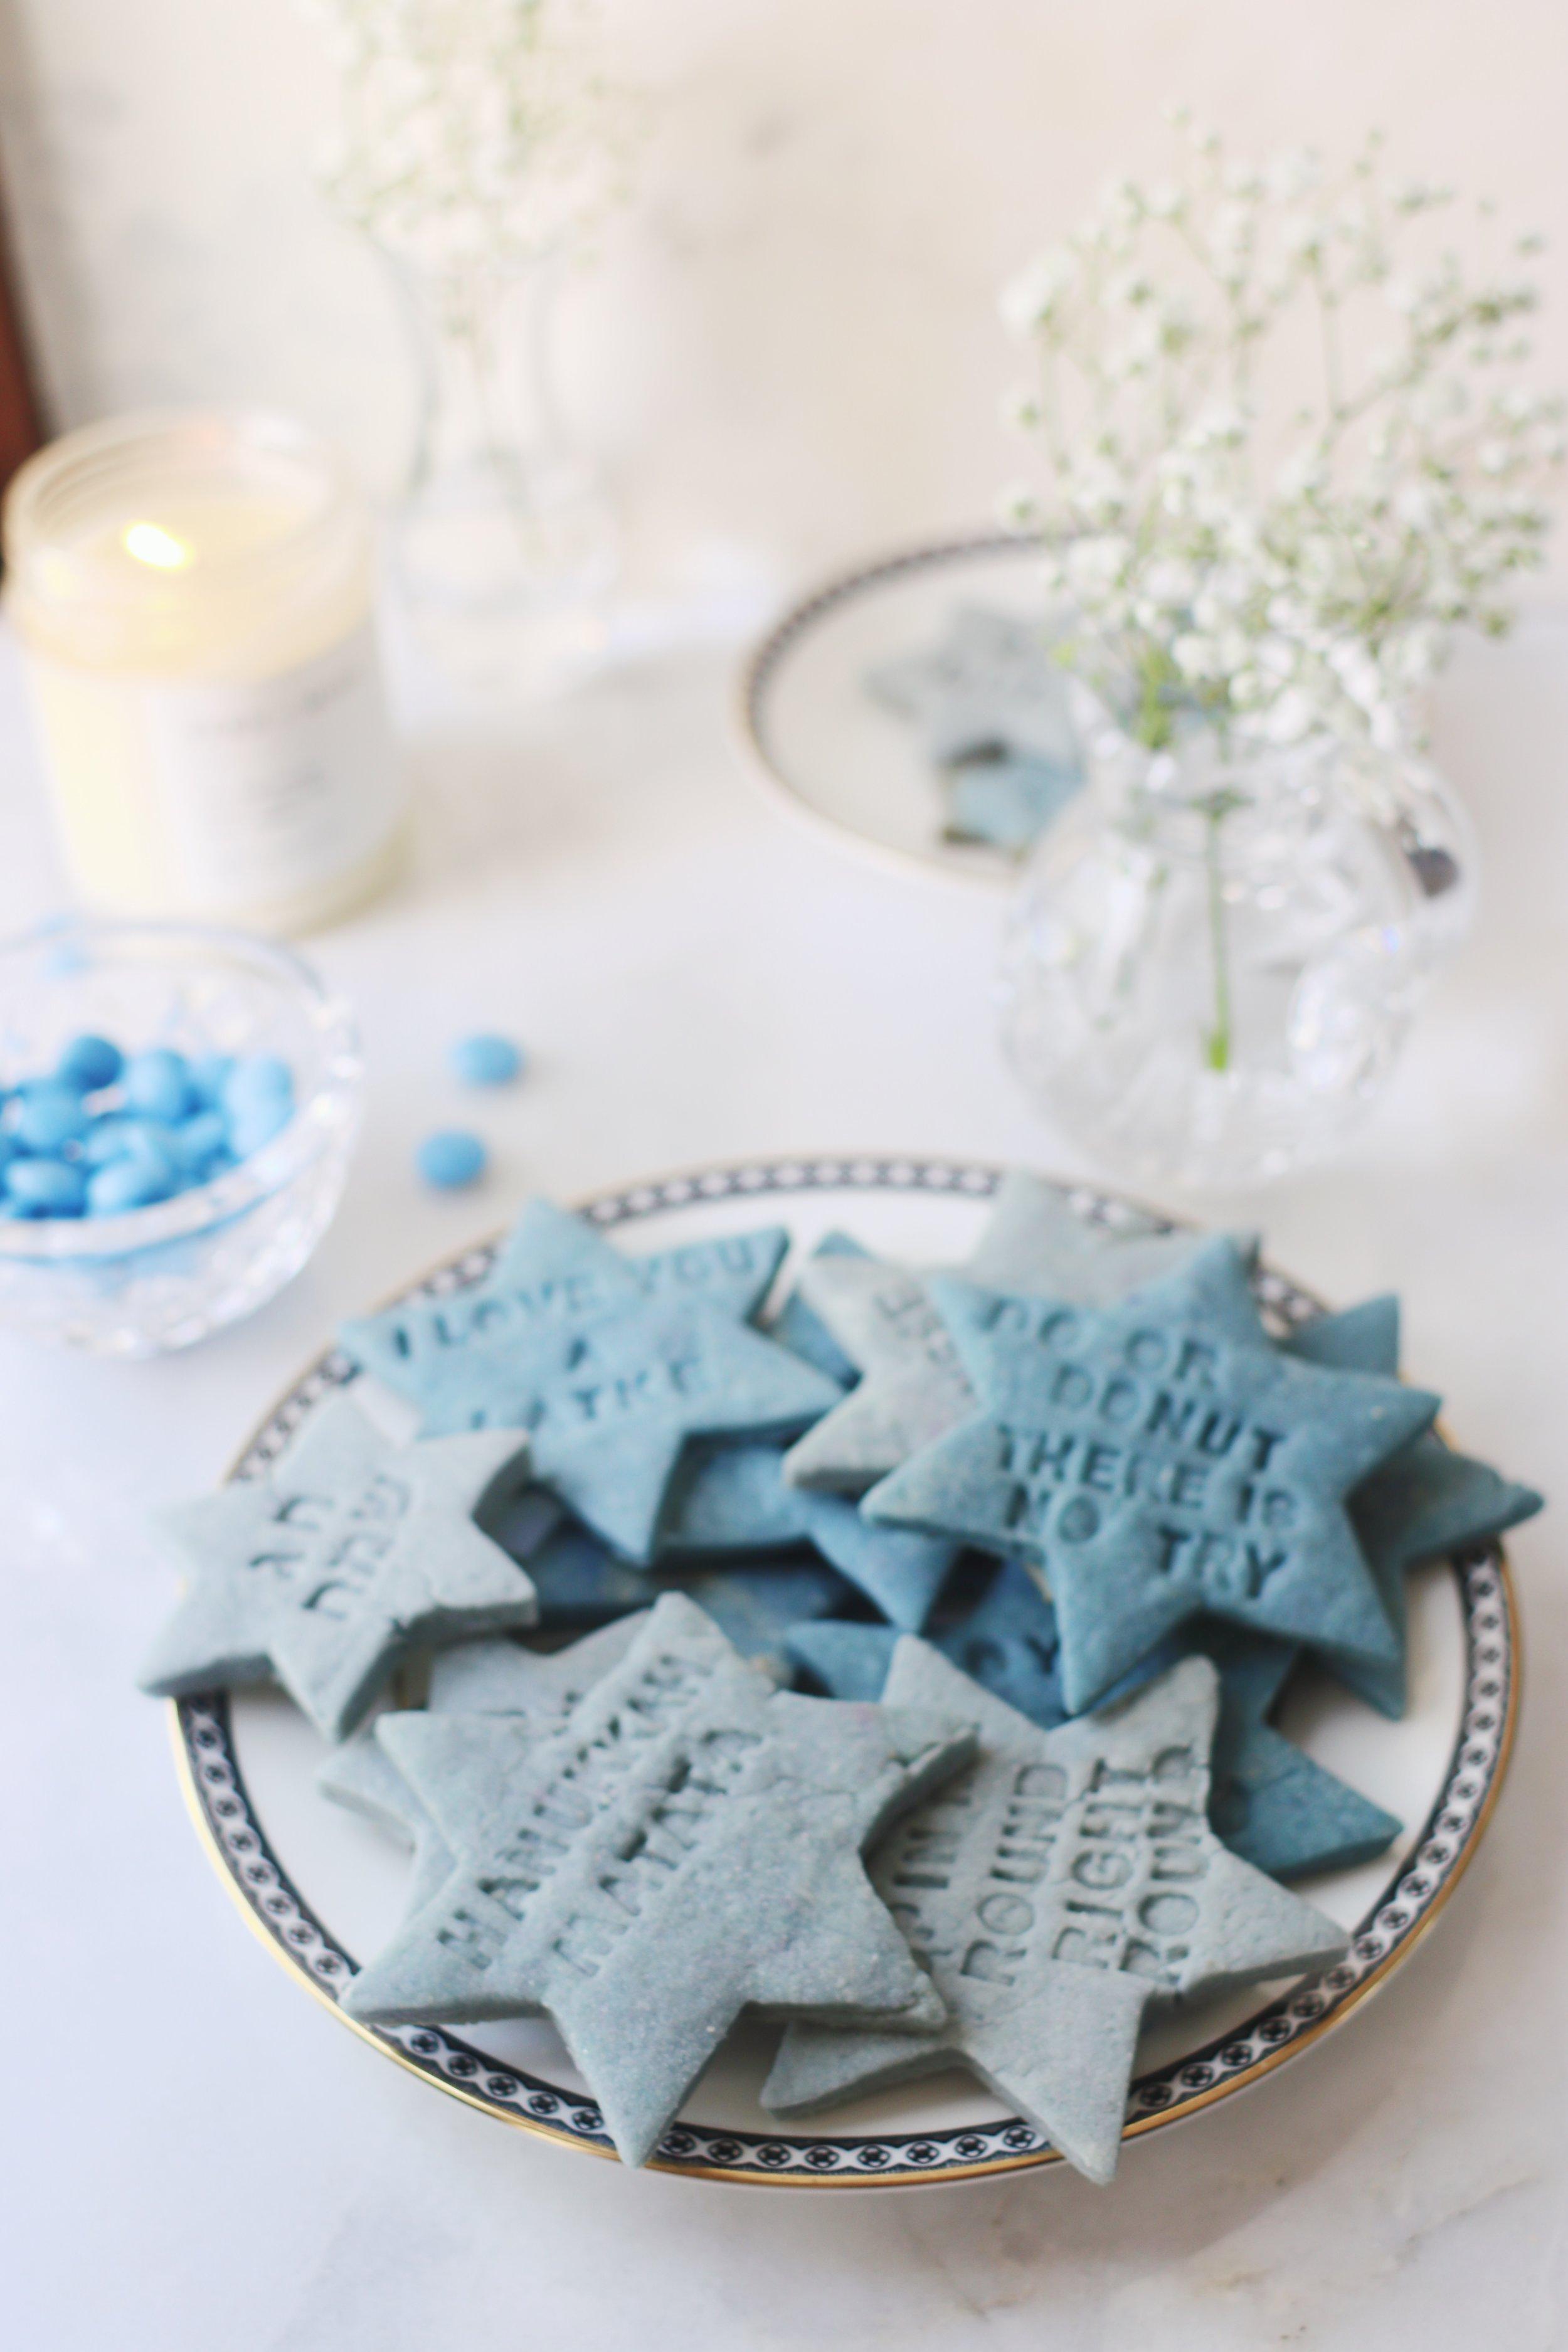 hanukkah-pun-cookies-hanukkah-dessert-19.JPG